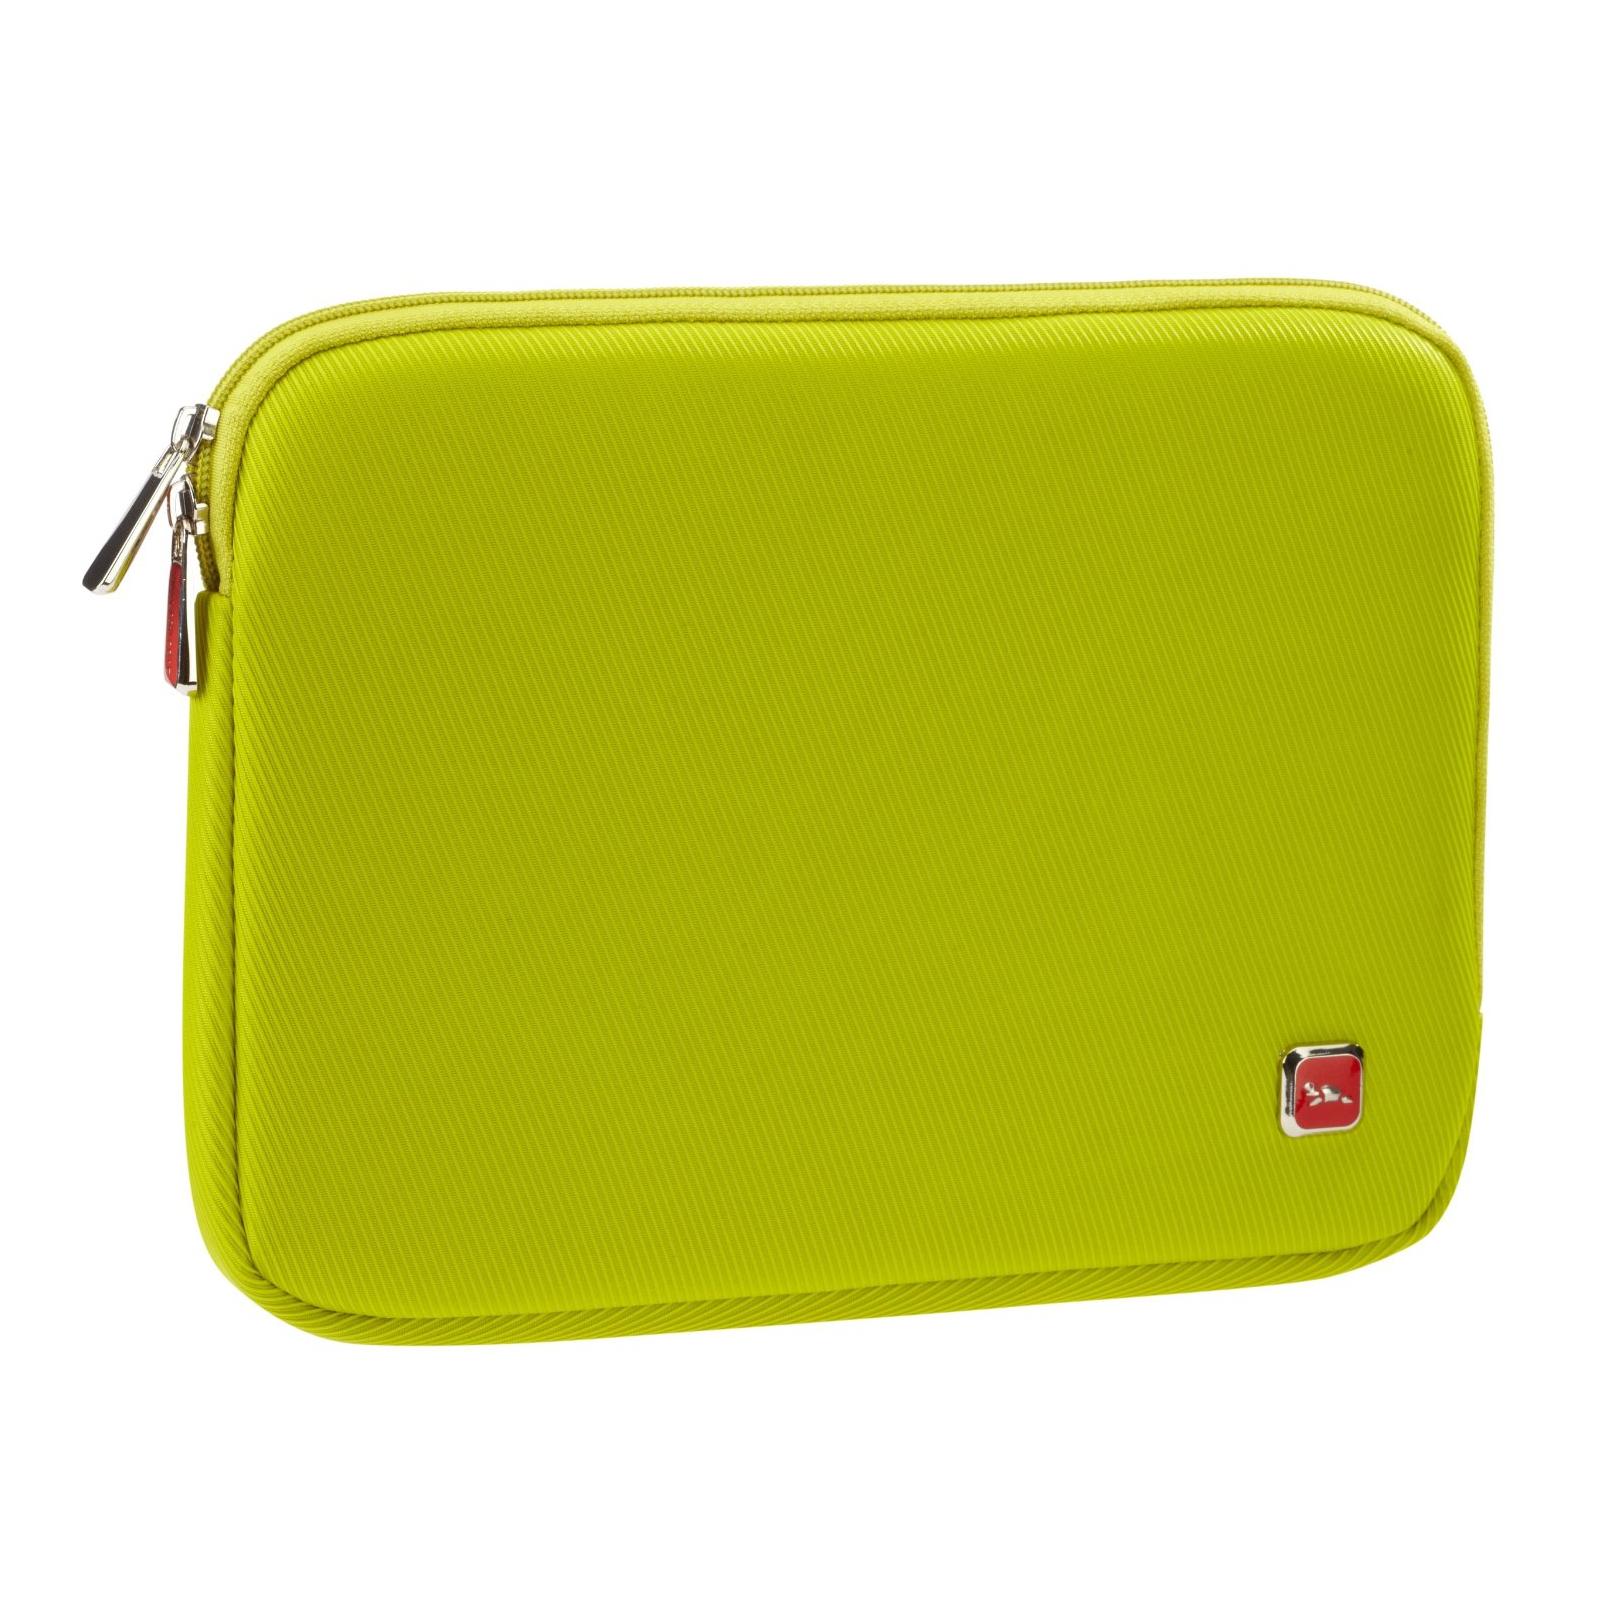 9a165401243f Чехол для планшета RivaCase 10.1 Universal (5210 (Lime)) цены в ...